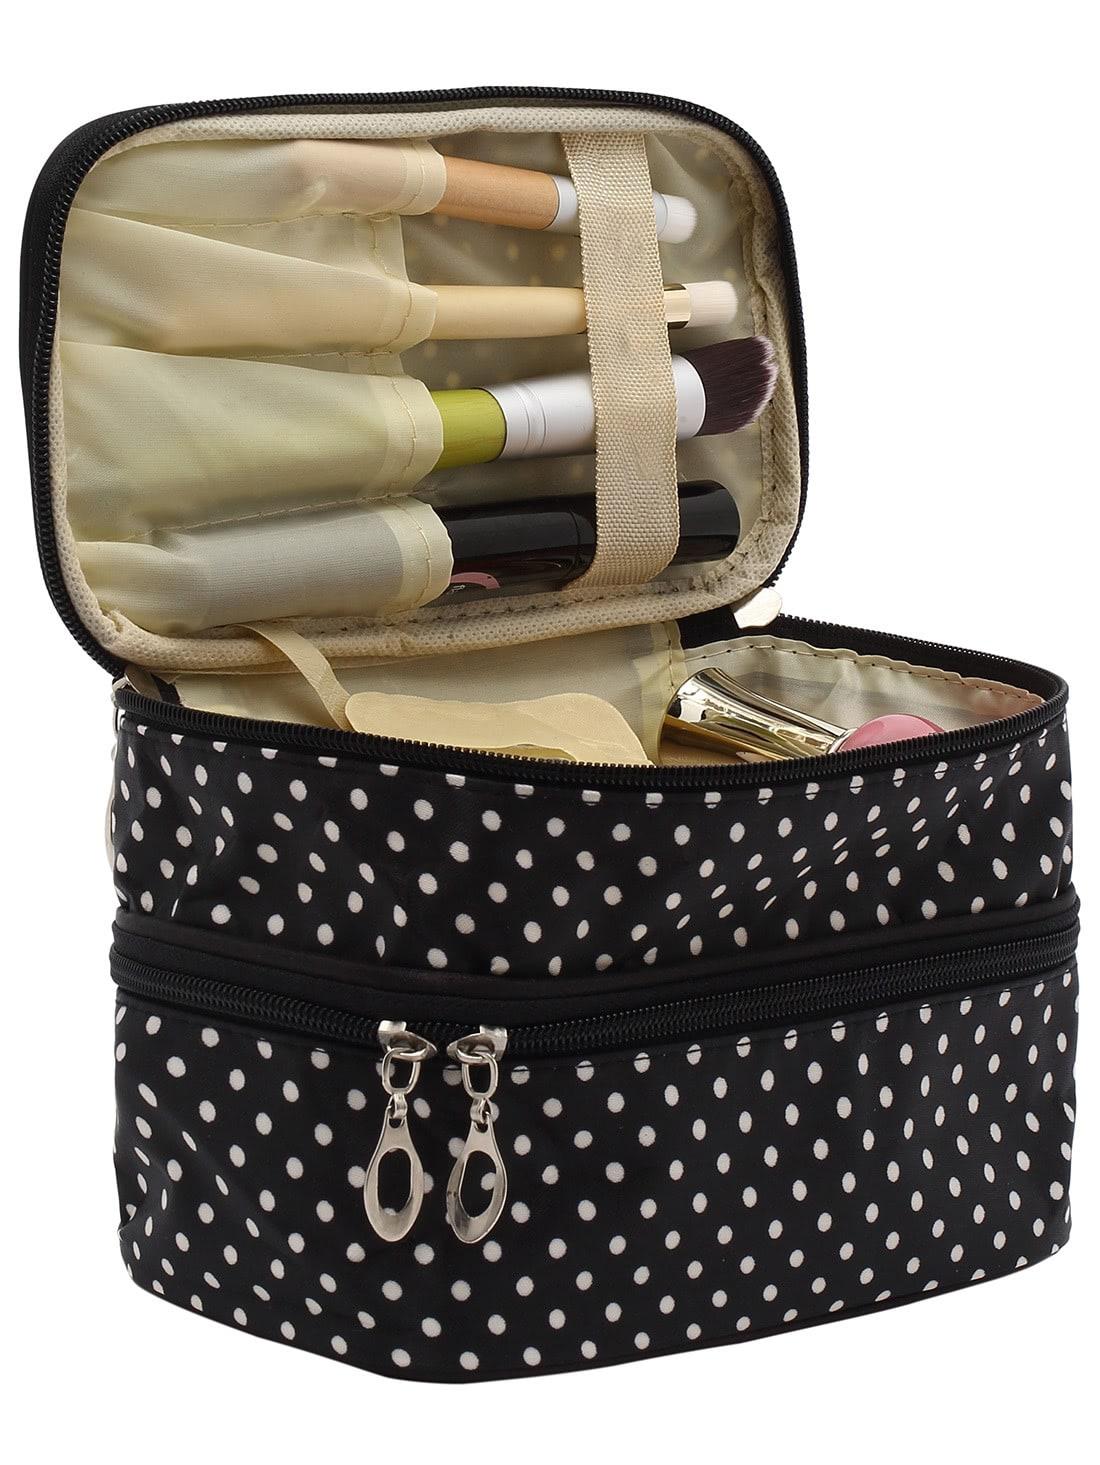 Black Polka Dot Double Layers Cosmetic Bag transer jasmine polka dot flip double zipper cosmetic bag 0213 drop shipping